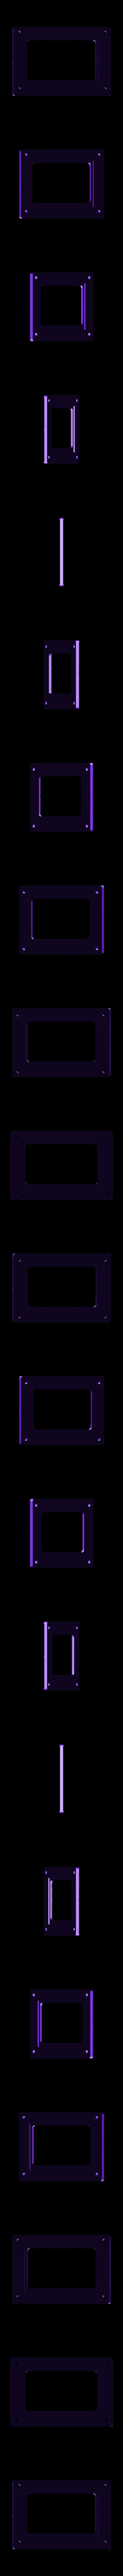 power_inlet_panel_mounting_frame.stl Download free STL file Portable 3D Printer • 3D printable design, Job